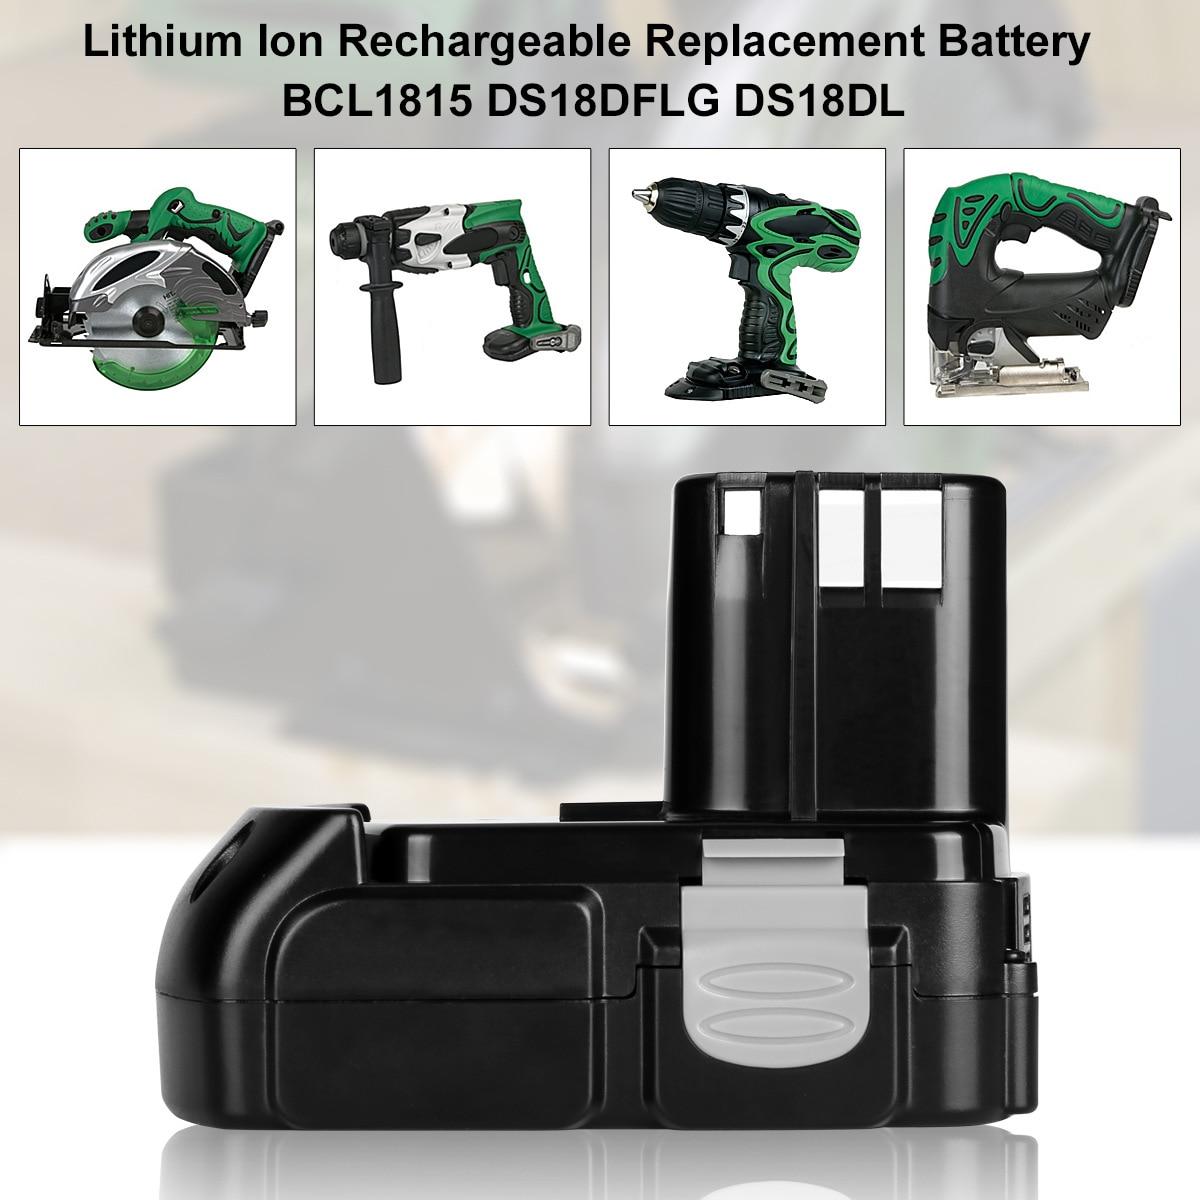 18V 2.0Ah بطاريّة ليثيوم قابلة لإعادة الشحن ل هيتاشي BCL1815 BCL1830 EBM1830 DS18DFL CJ18DL DS18DL WR18DMR الطاقة أدوات Batteria